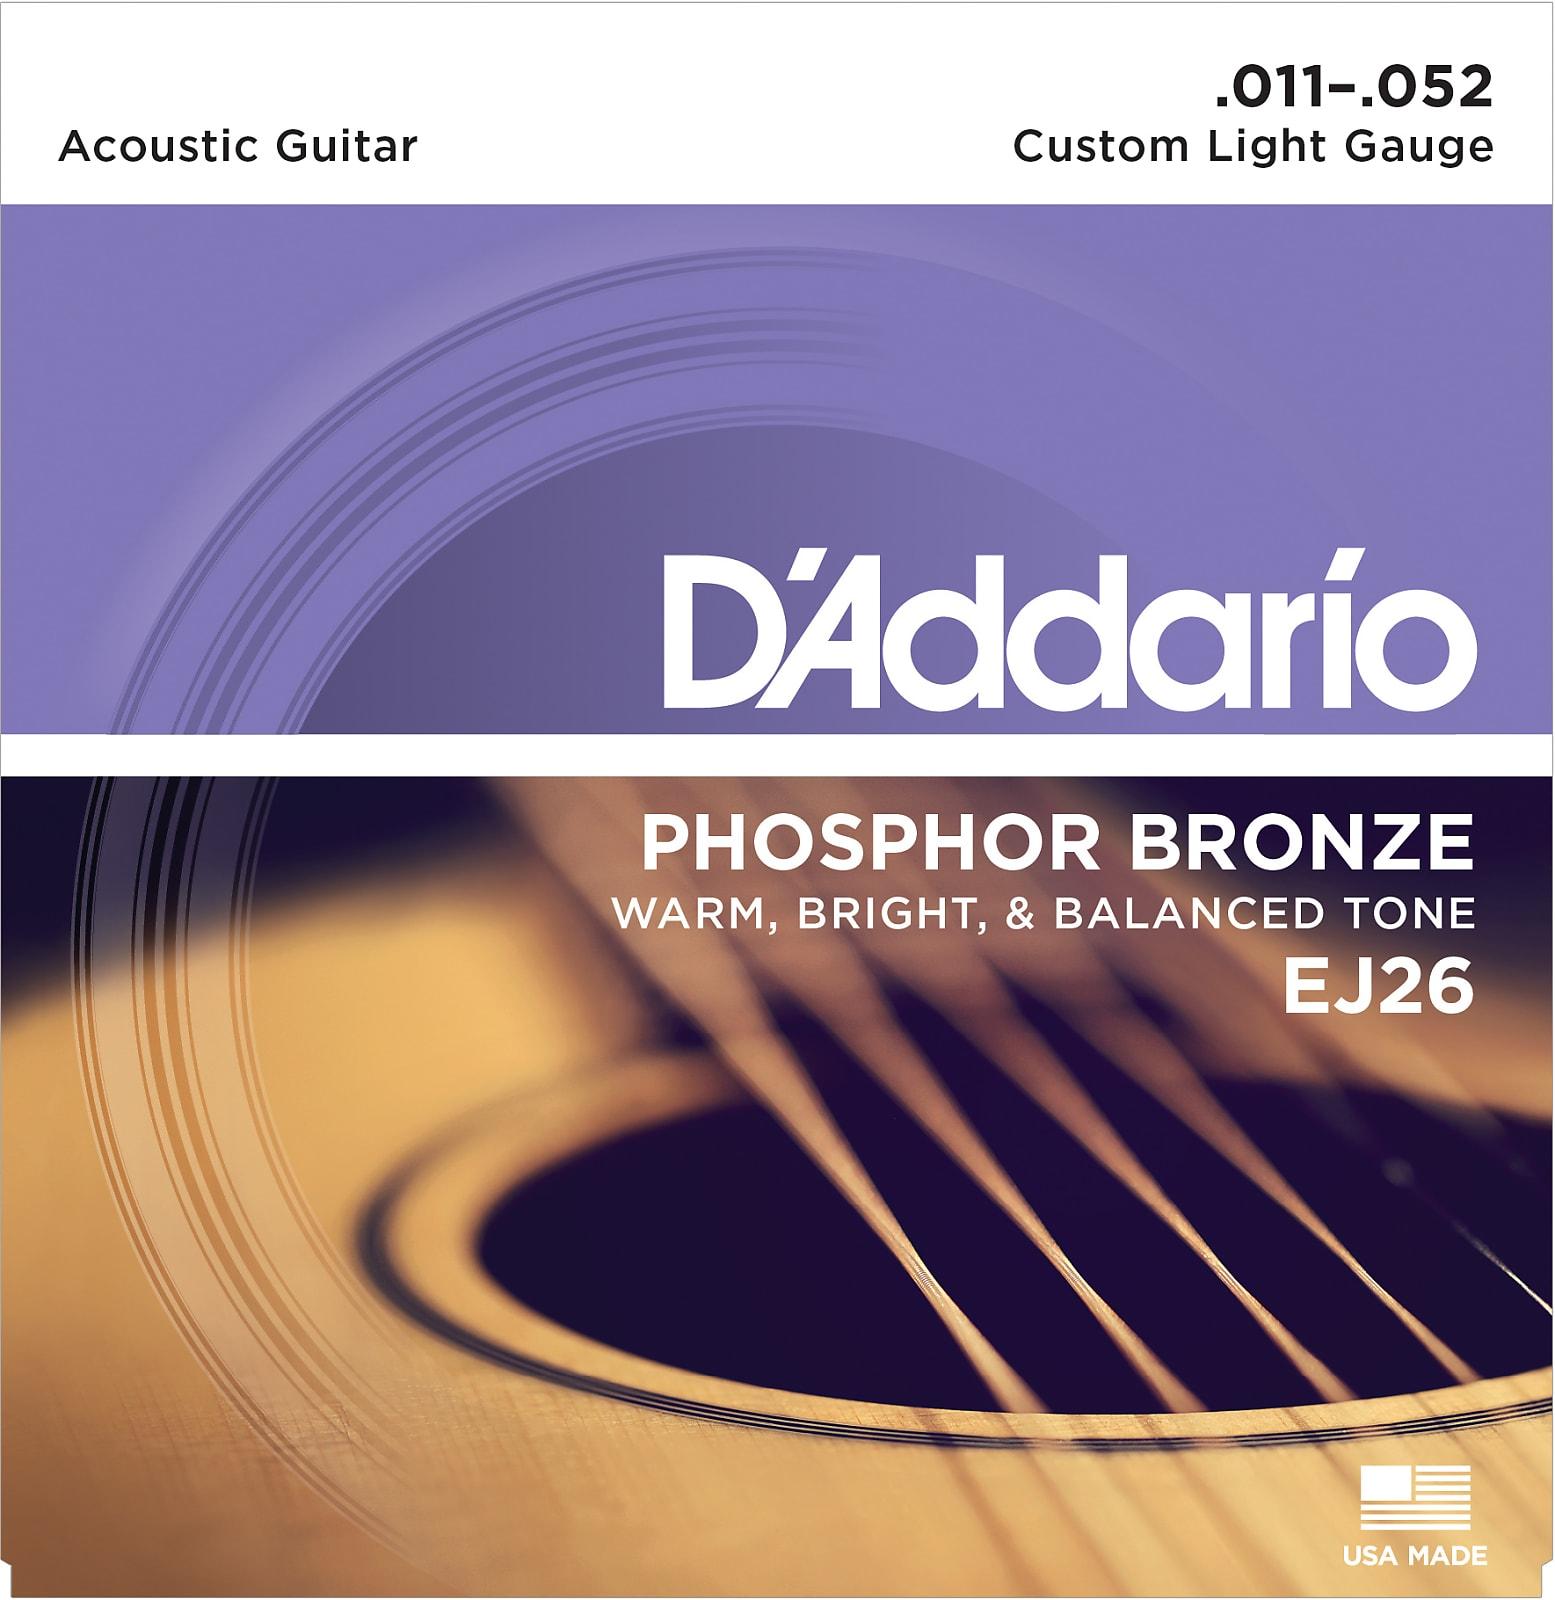 D'Addario EJ26 Phosphor Bronze Acoustic Guitar Strings, Custom Light, 11-52